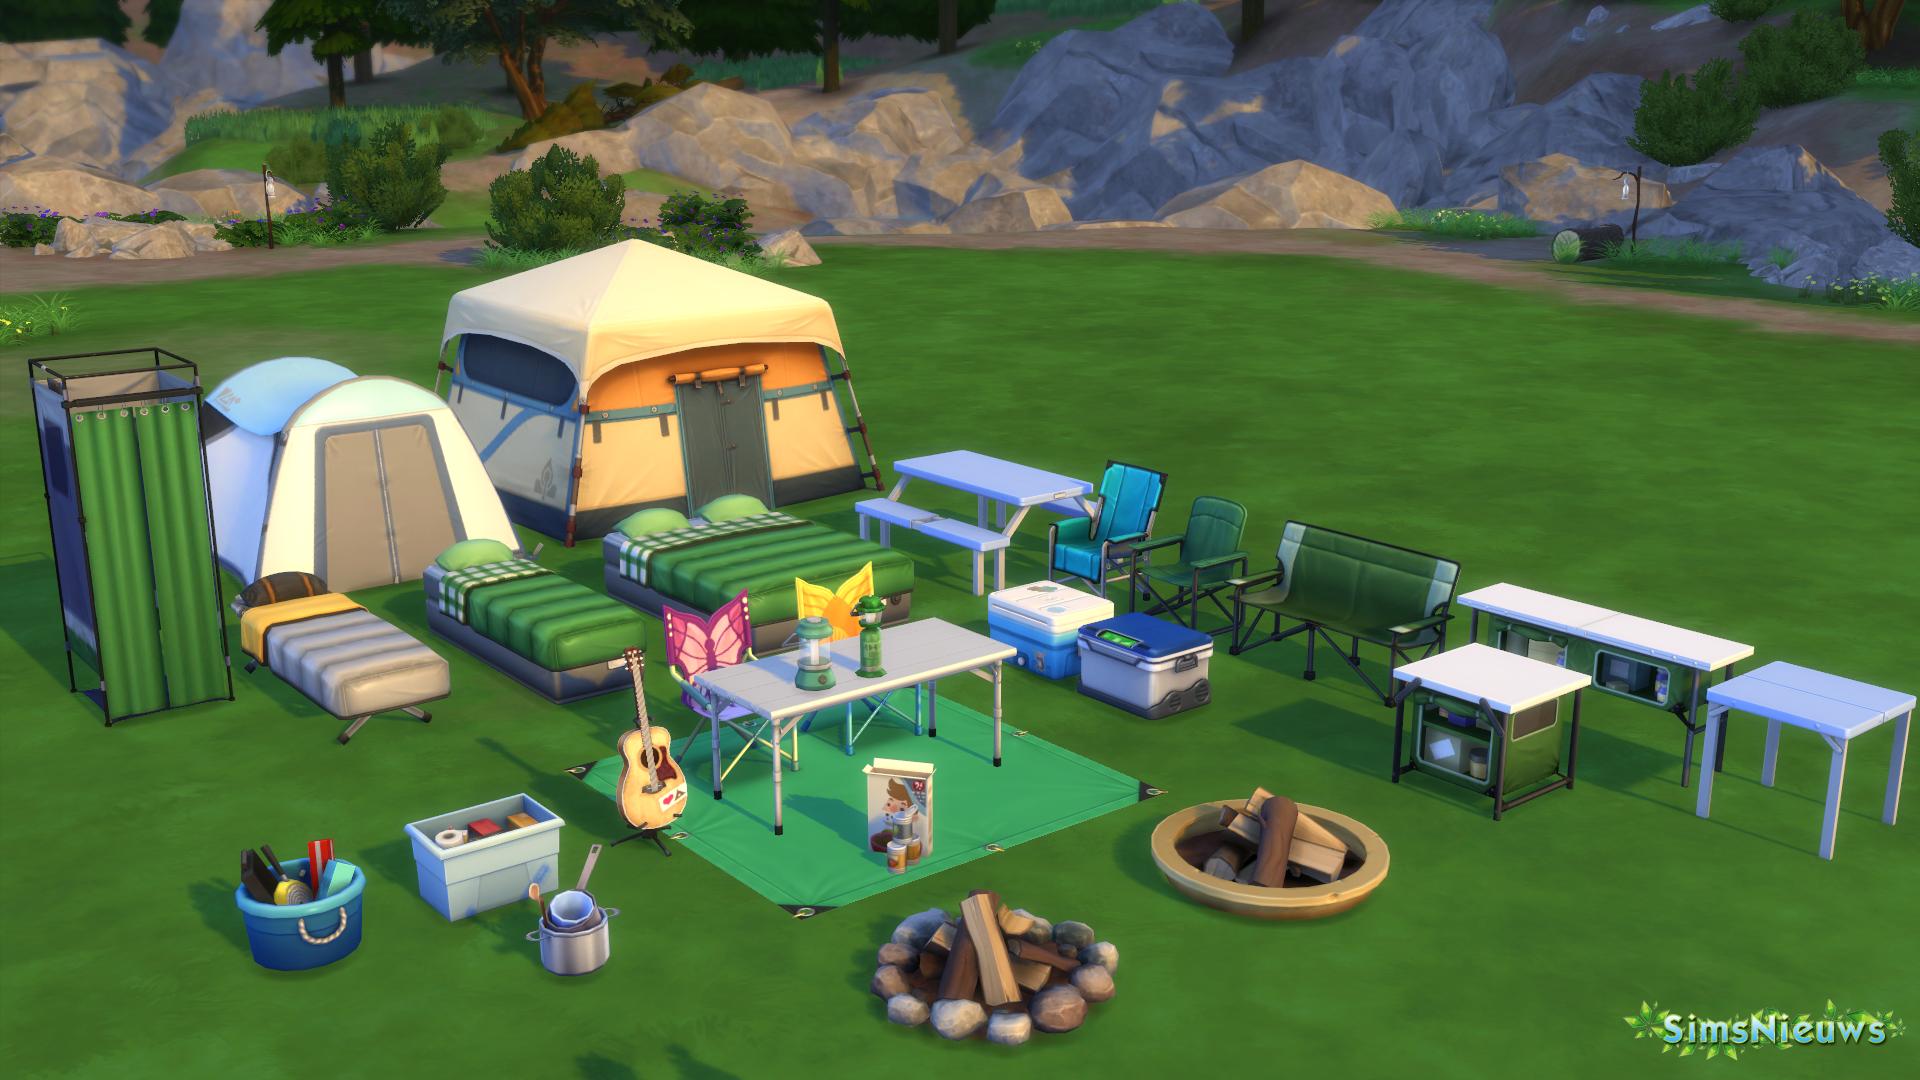 sn review de sims 4 in de natuur sims nieuws. Black Bedroom Furniture Sets. Home Design Ideas